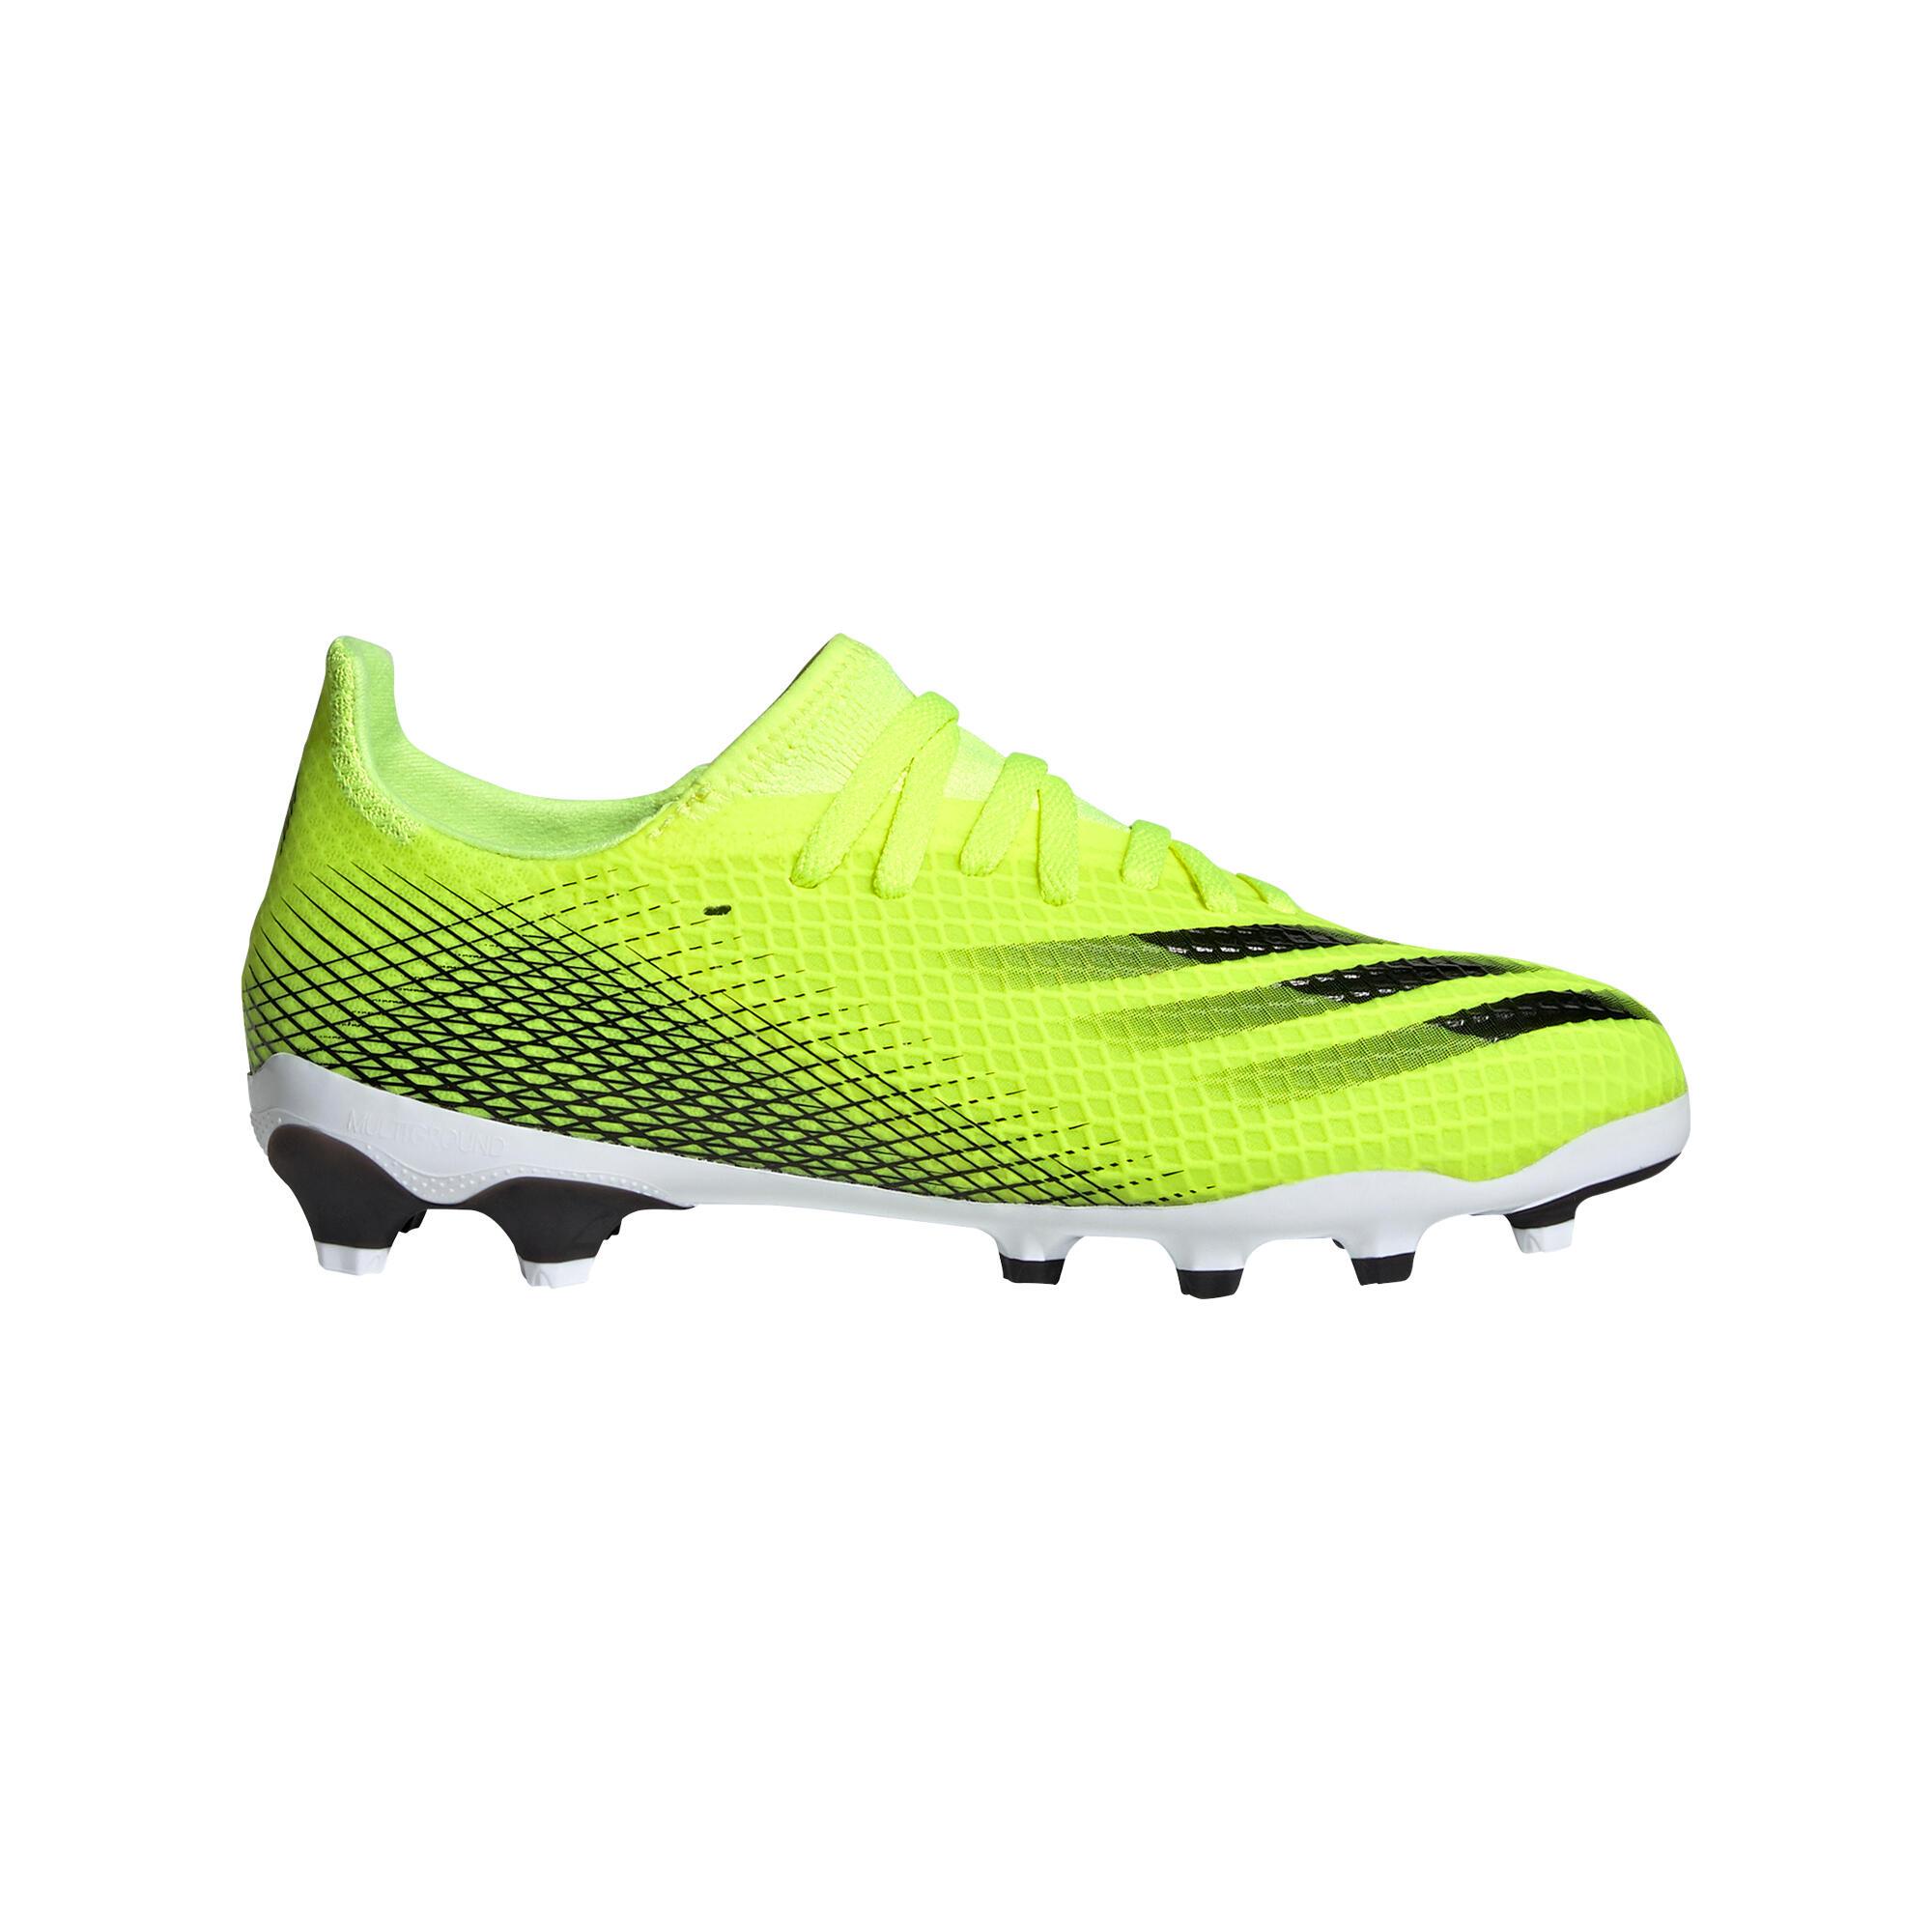 Fussballschuhe Nocken X.3 MG Kinder Adidas gelb